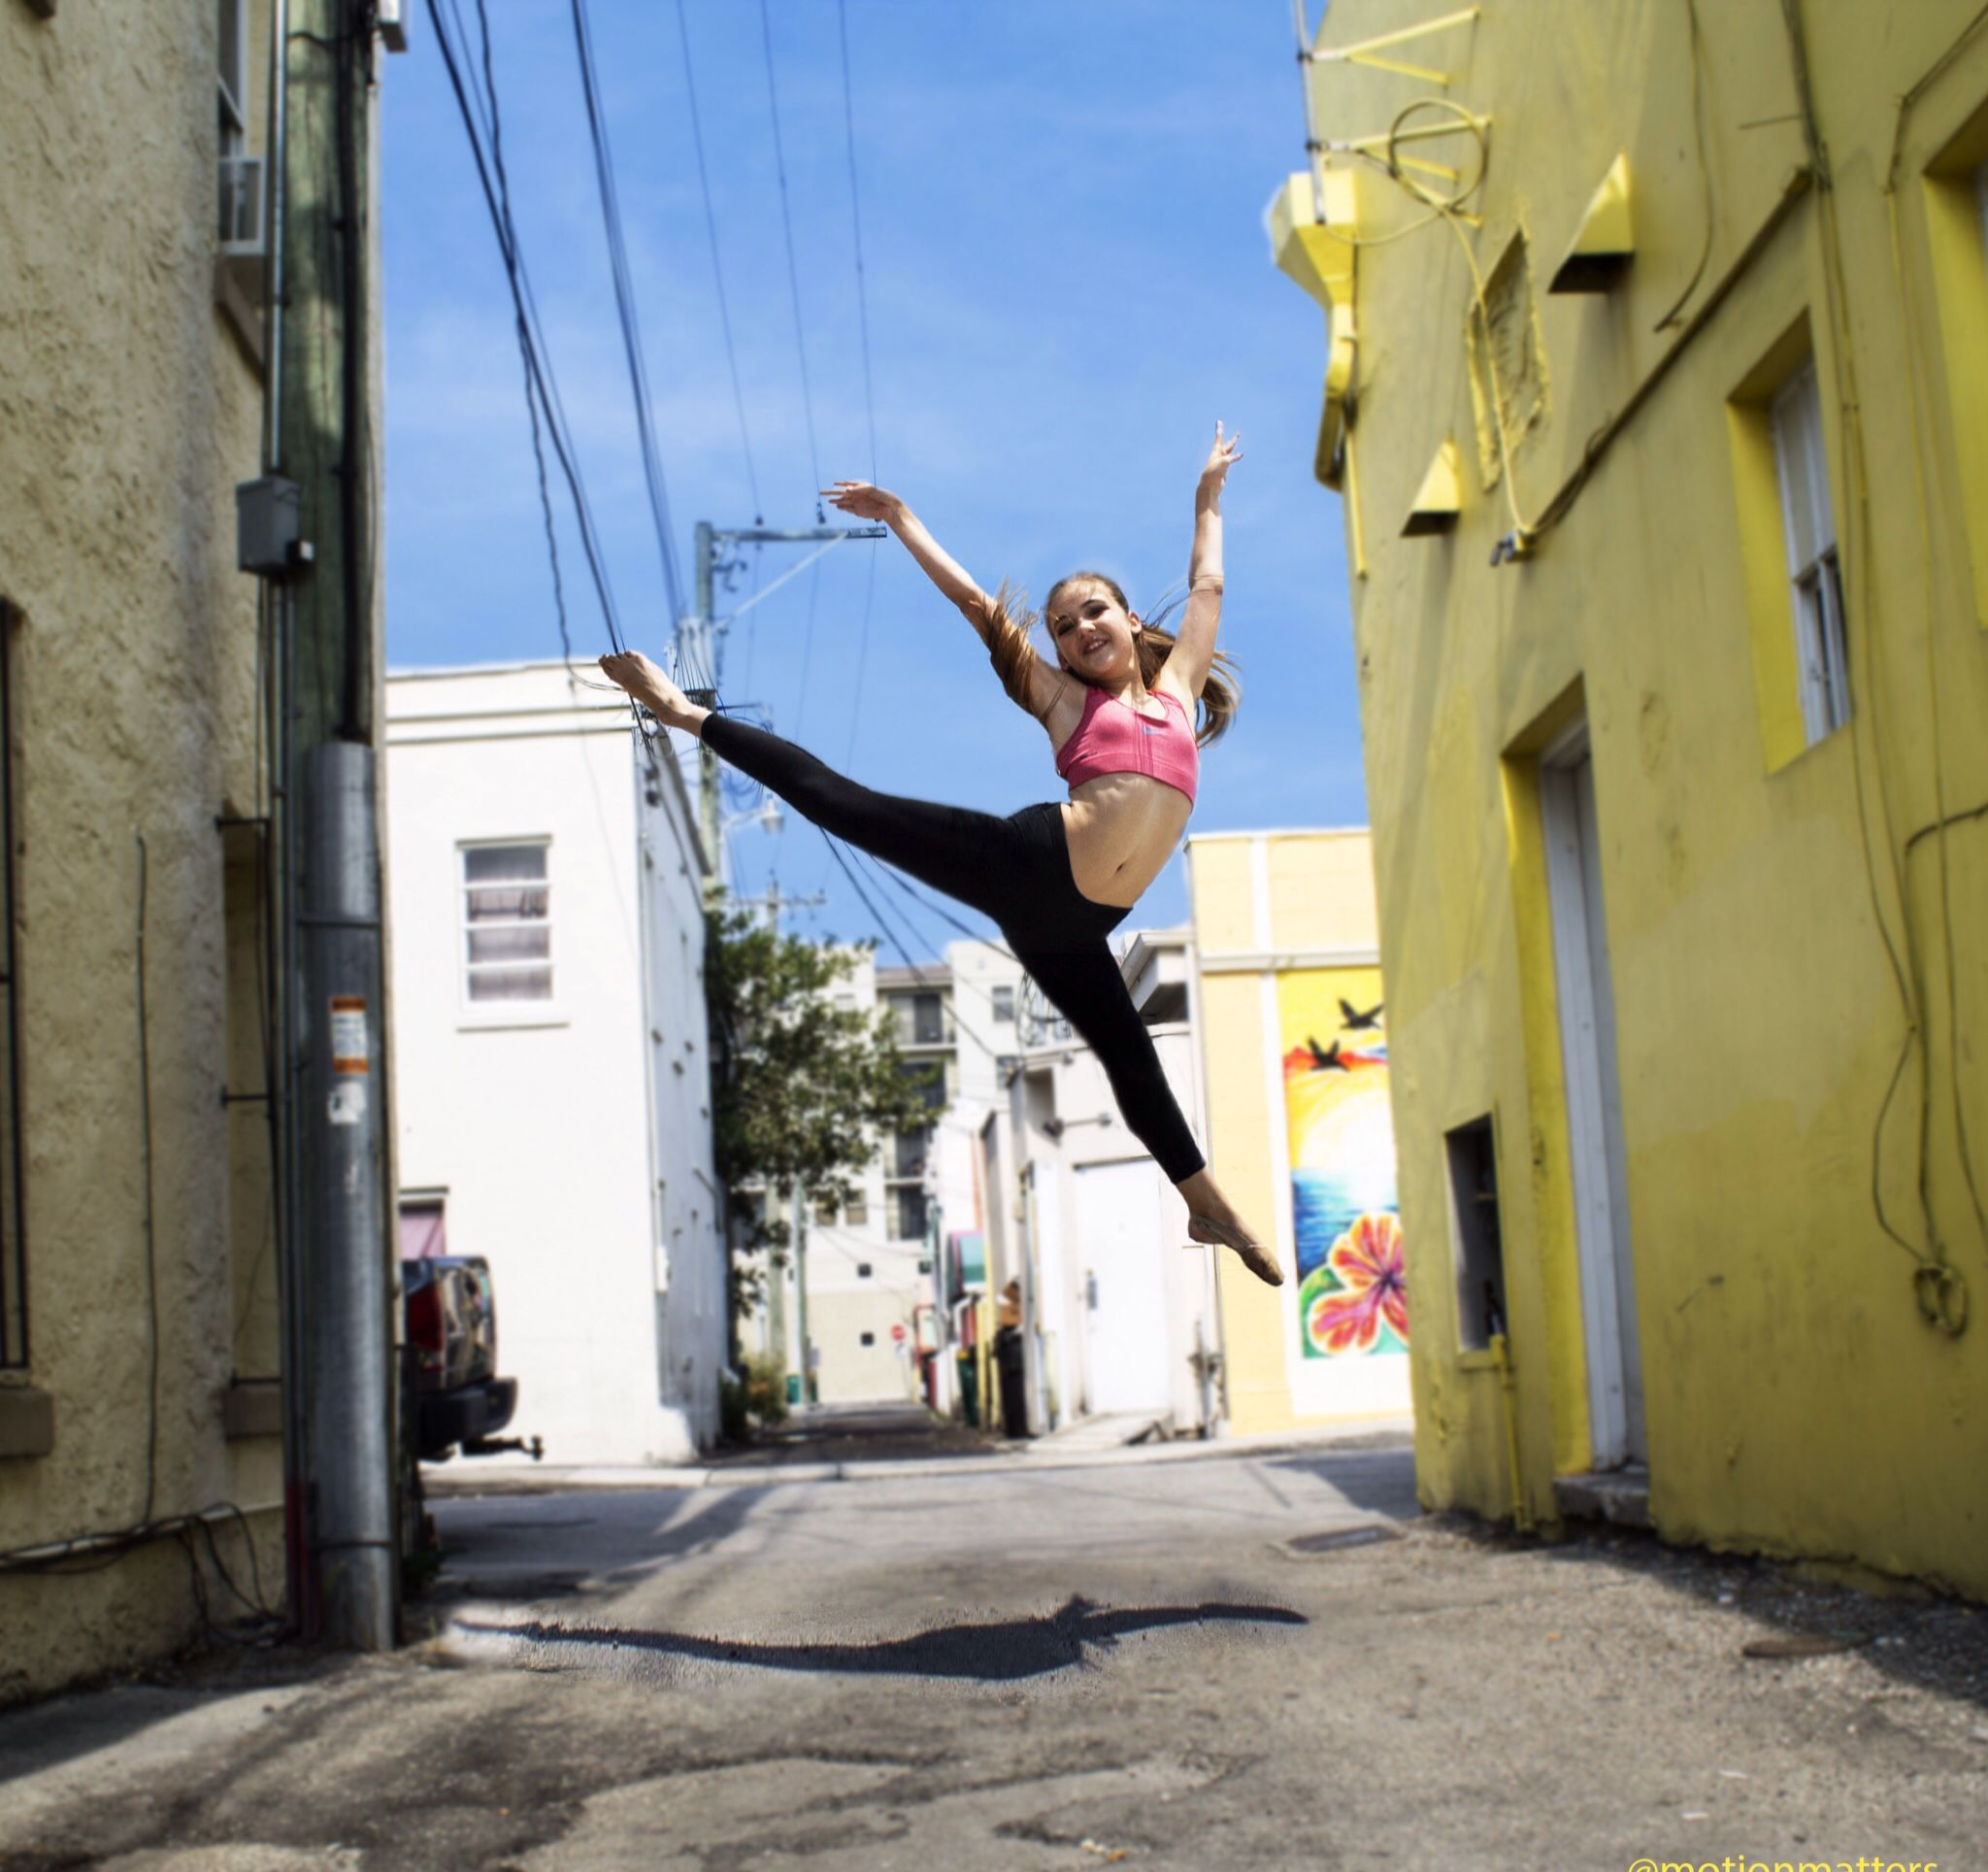 #Motionmatters #dance #leap #photography